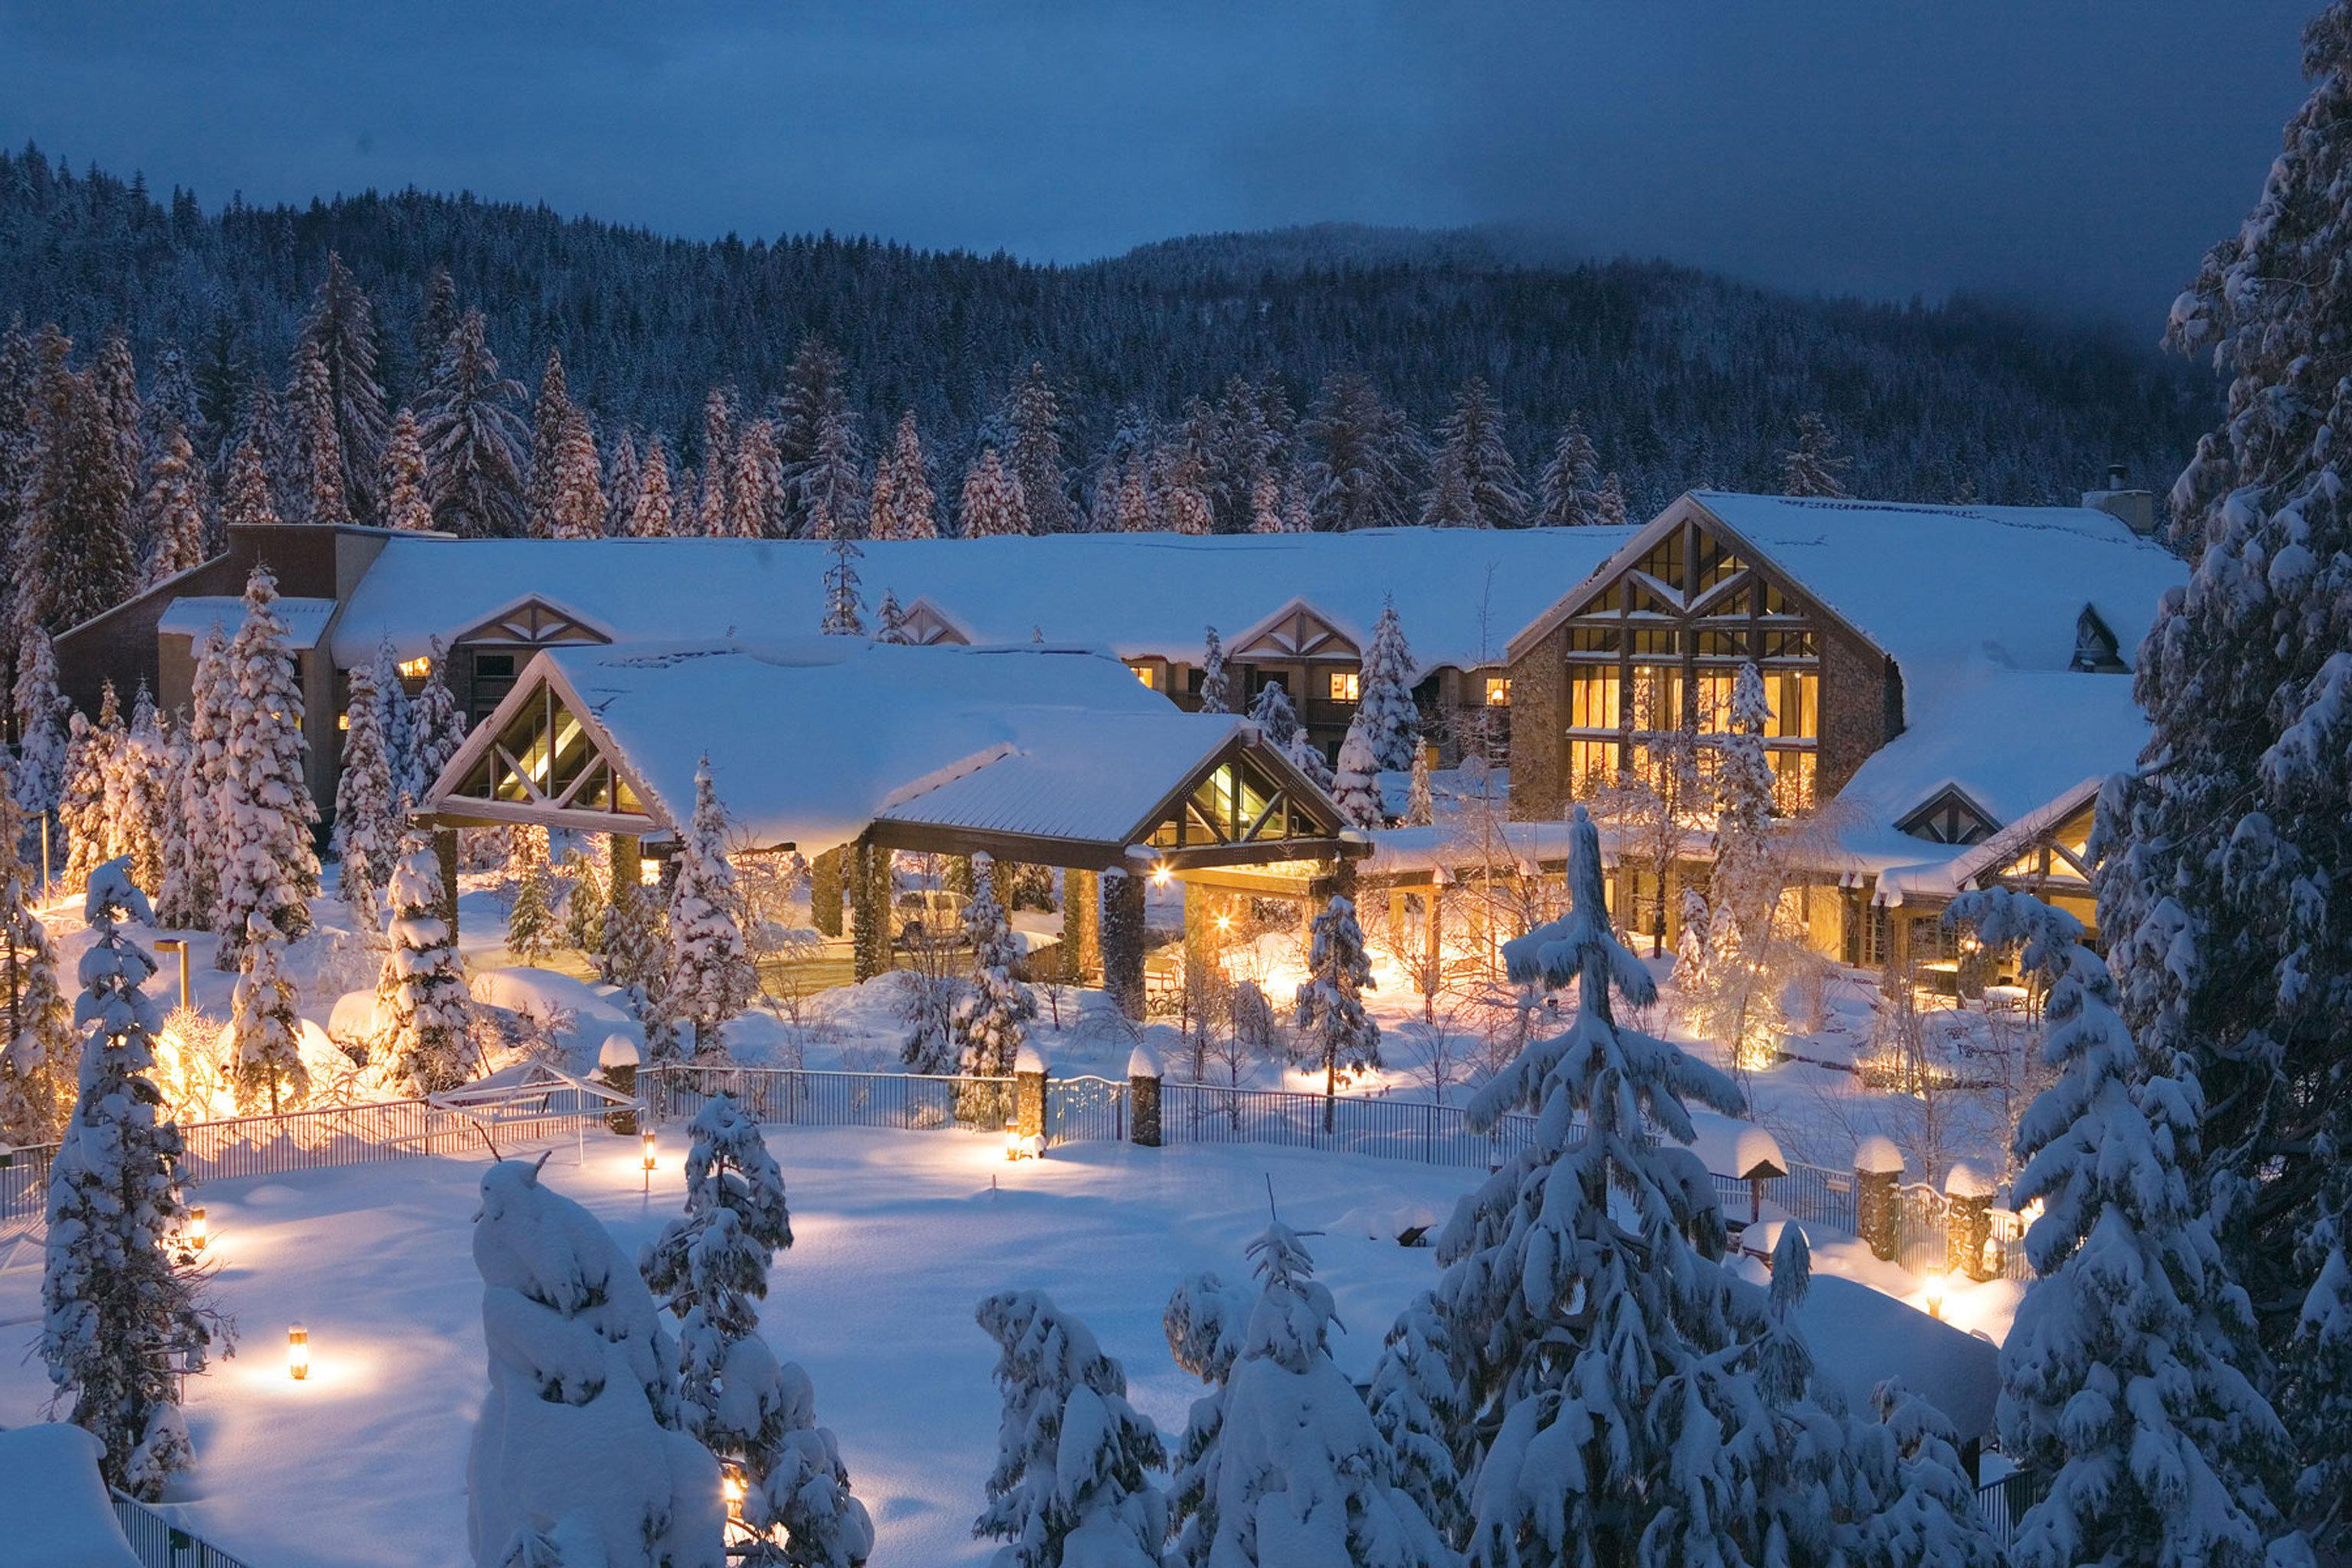 Country Exterior Grounds Lodge Rustic tree sky snow Winter weather season Resort mountain mountain range piste